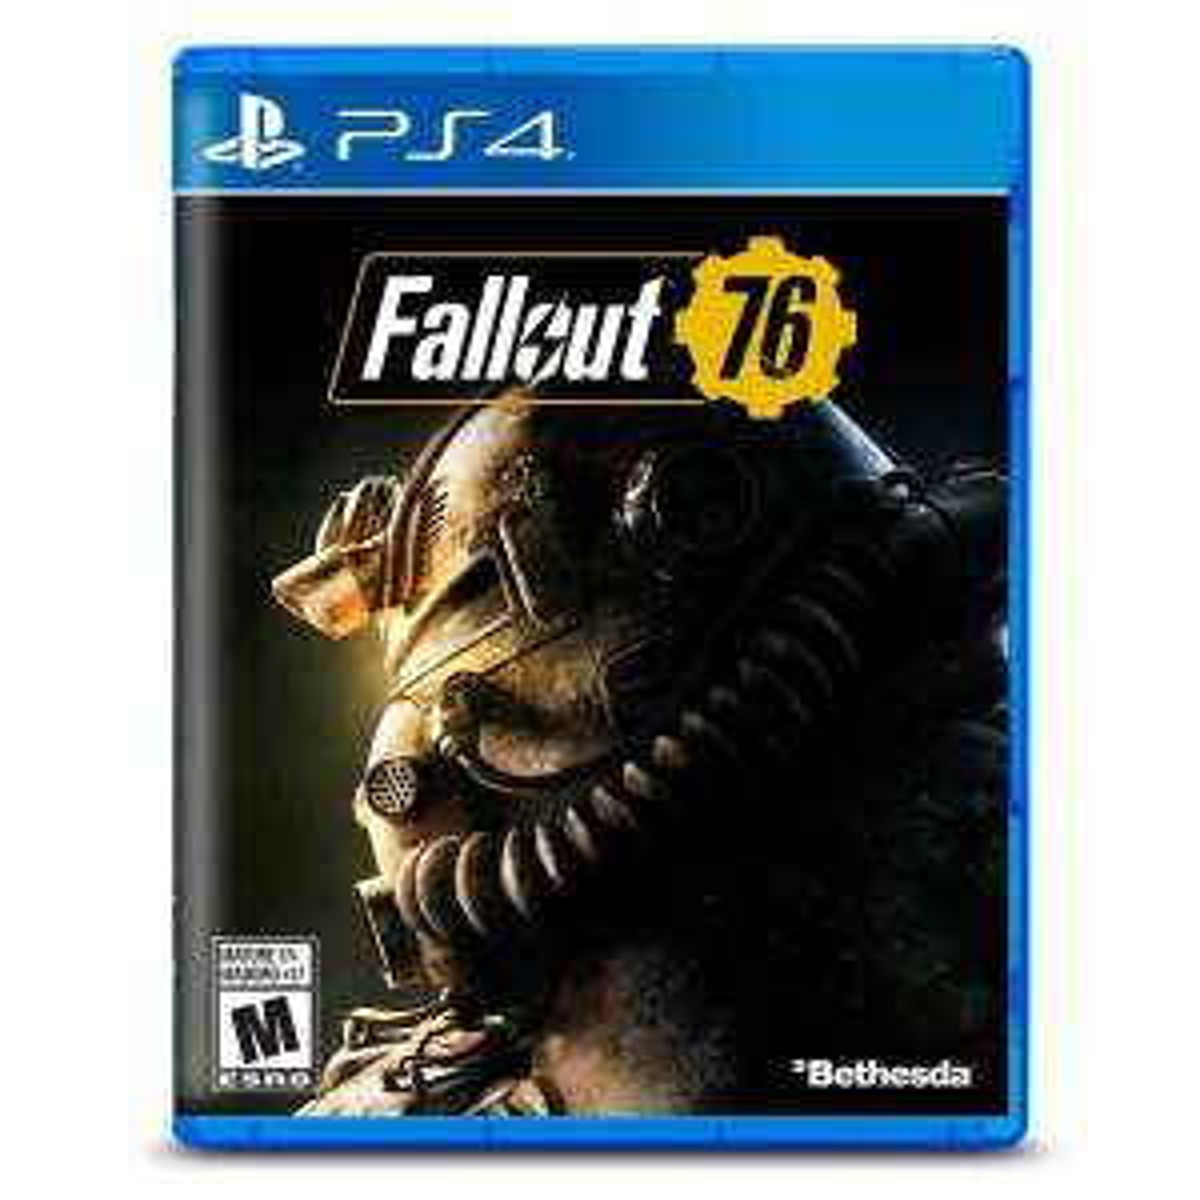 Sears: Fallout 76 PS4 $94